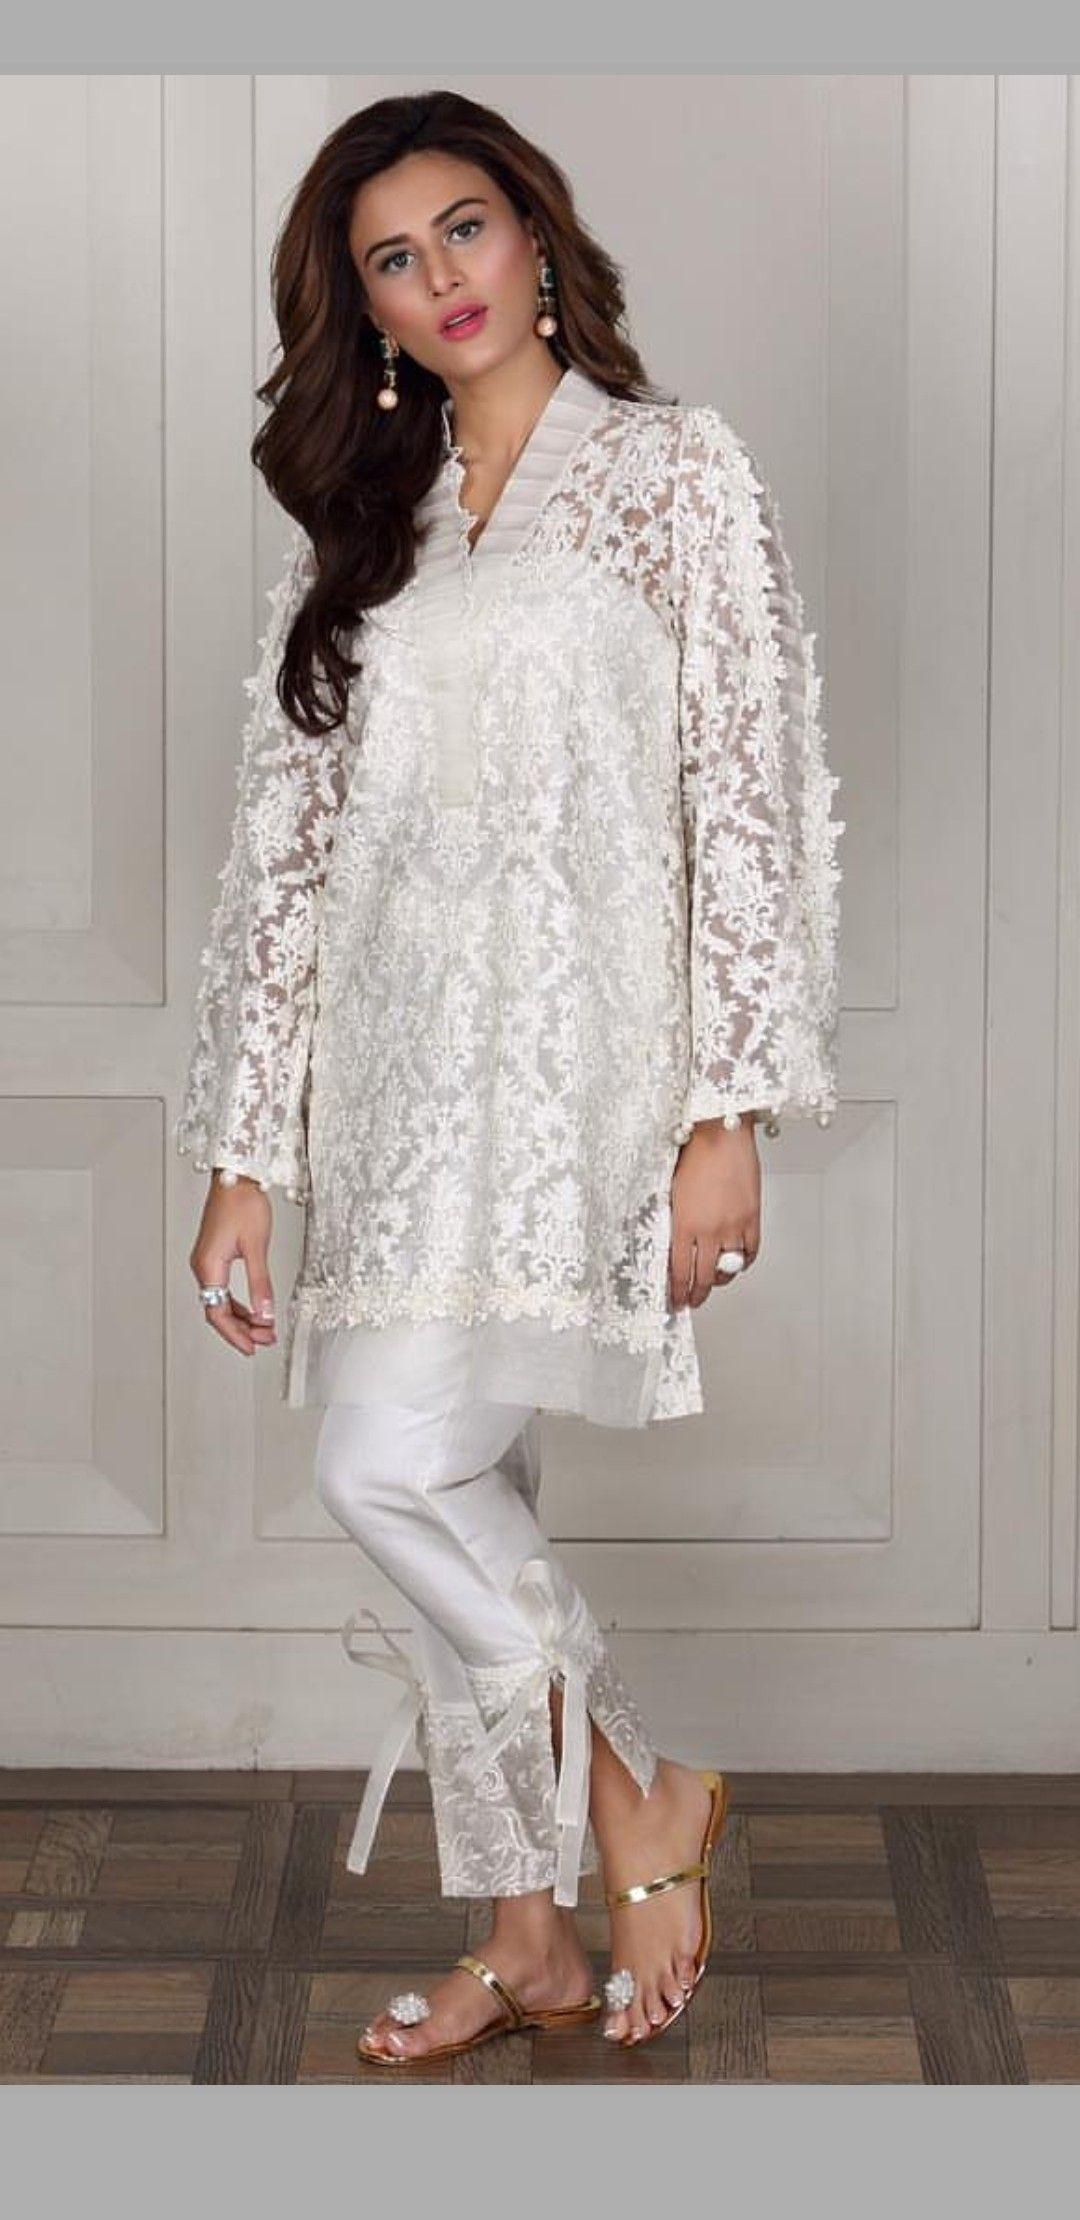 9fa668d774 Snow white Plus Size Cocktail Dresses, Pakistani Outfits, Latest Dress,  Indian Designer Wear